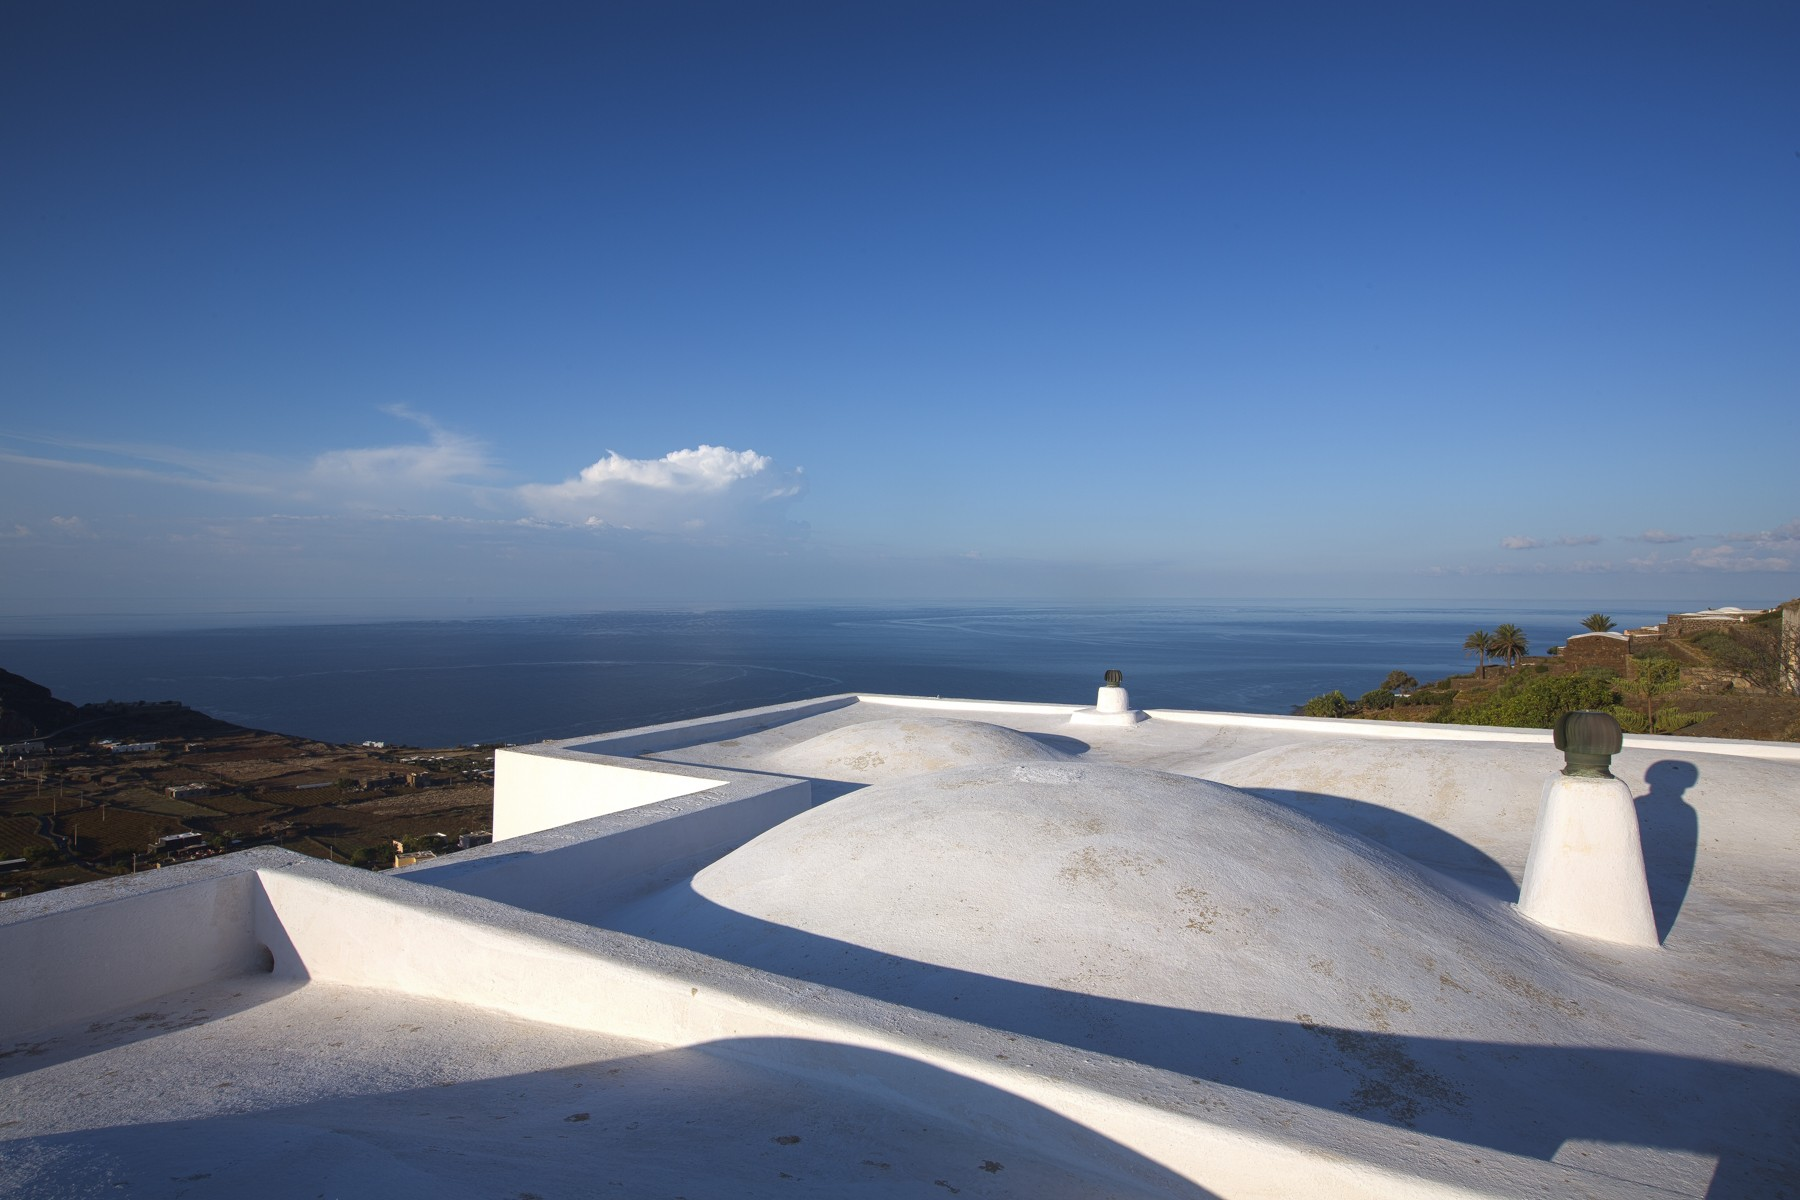 Villa in Vendita a Pantelleria: 5 locali, 530 mq - Foto 5